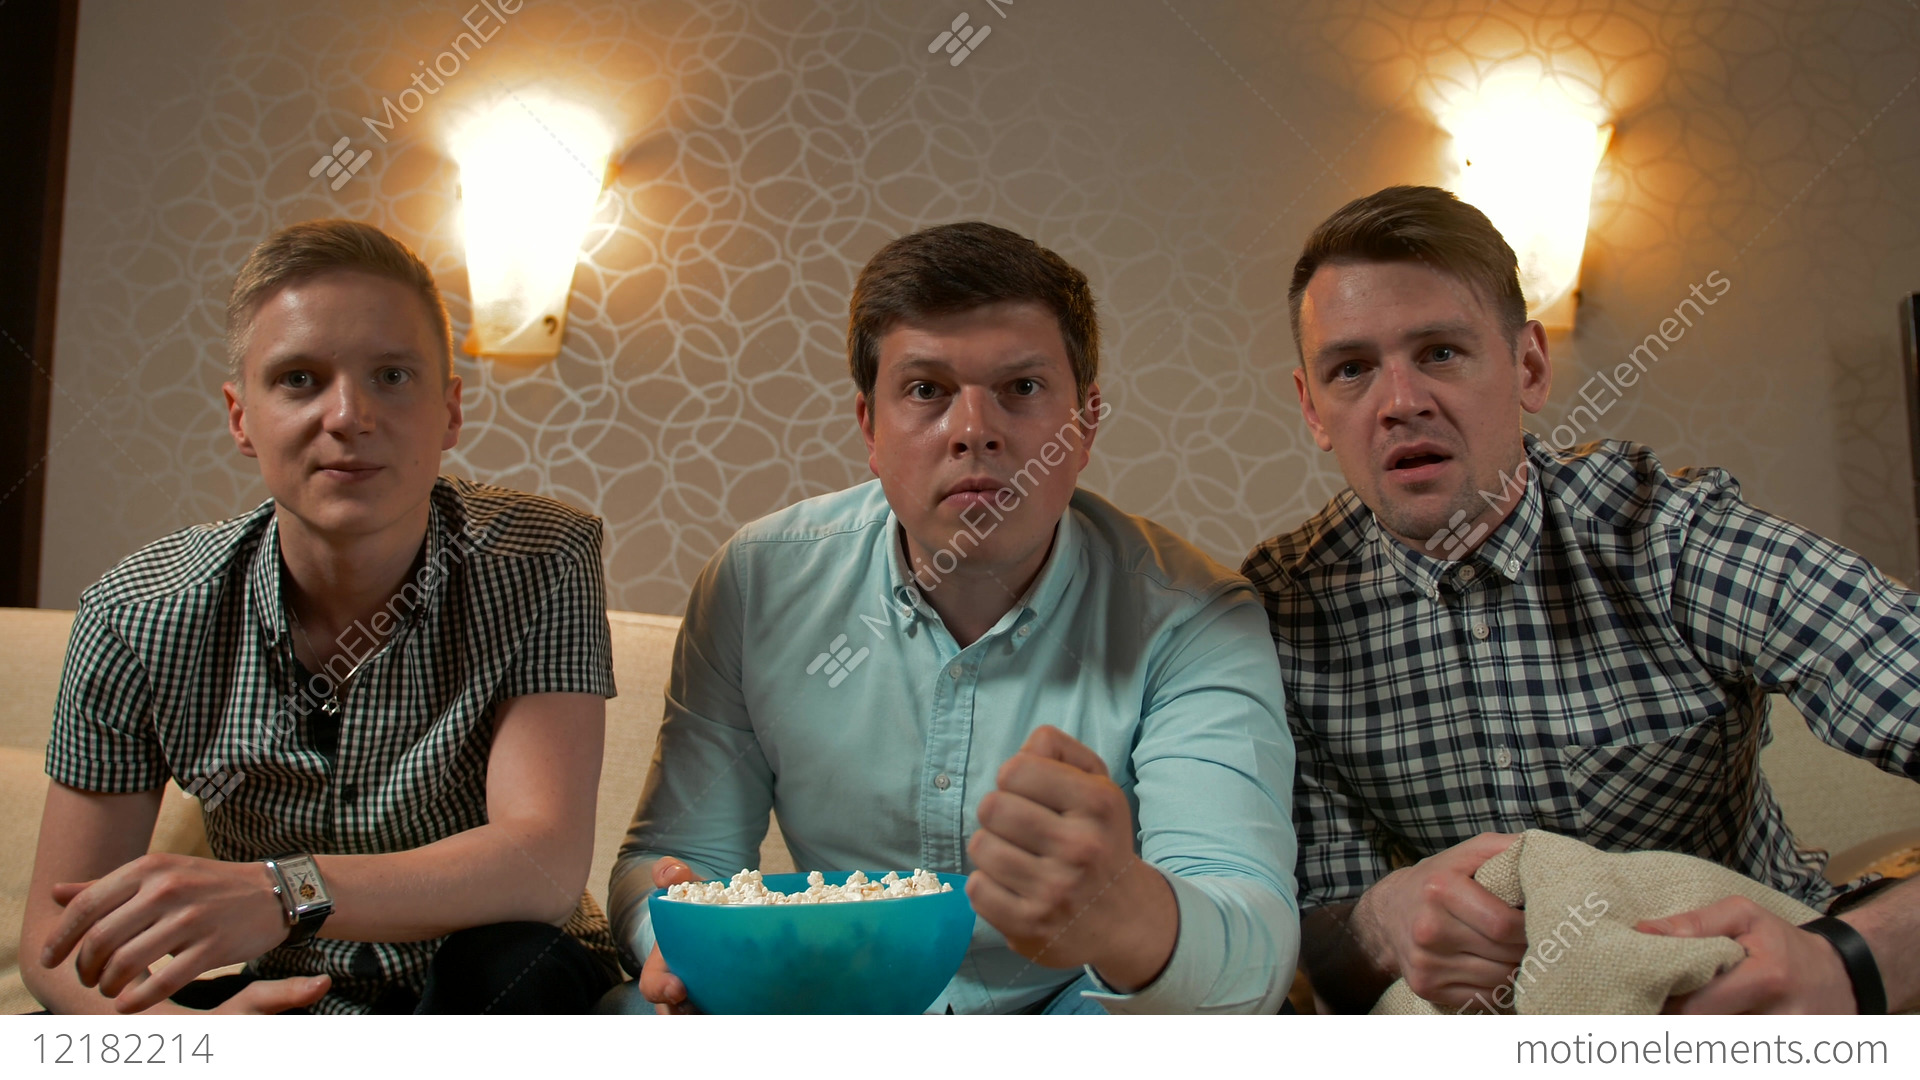 Three Best Friends Watching Football Tv At Home Enjoying Good Game